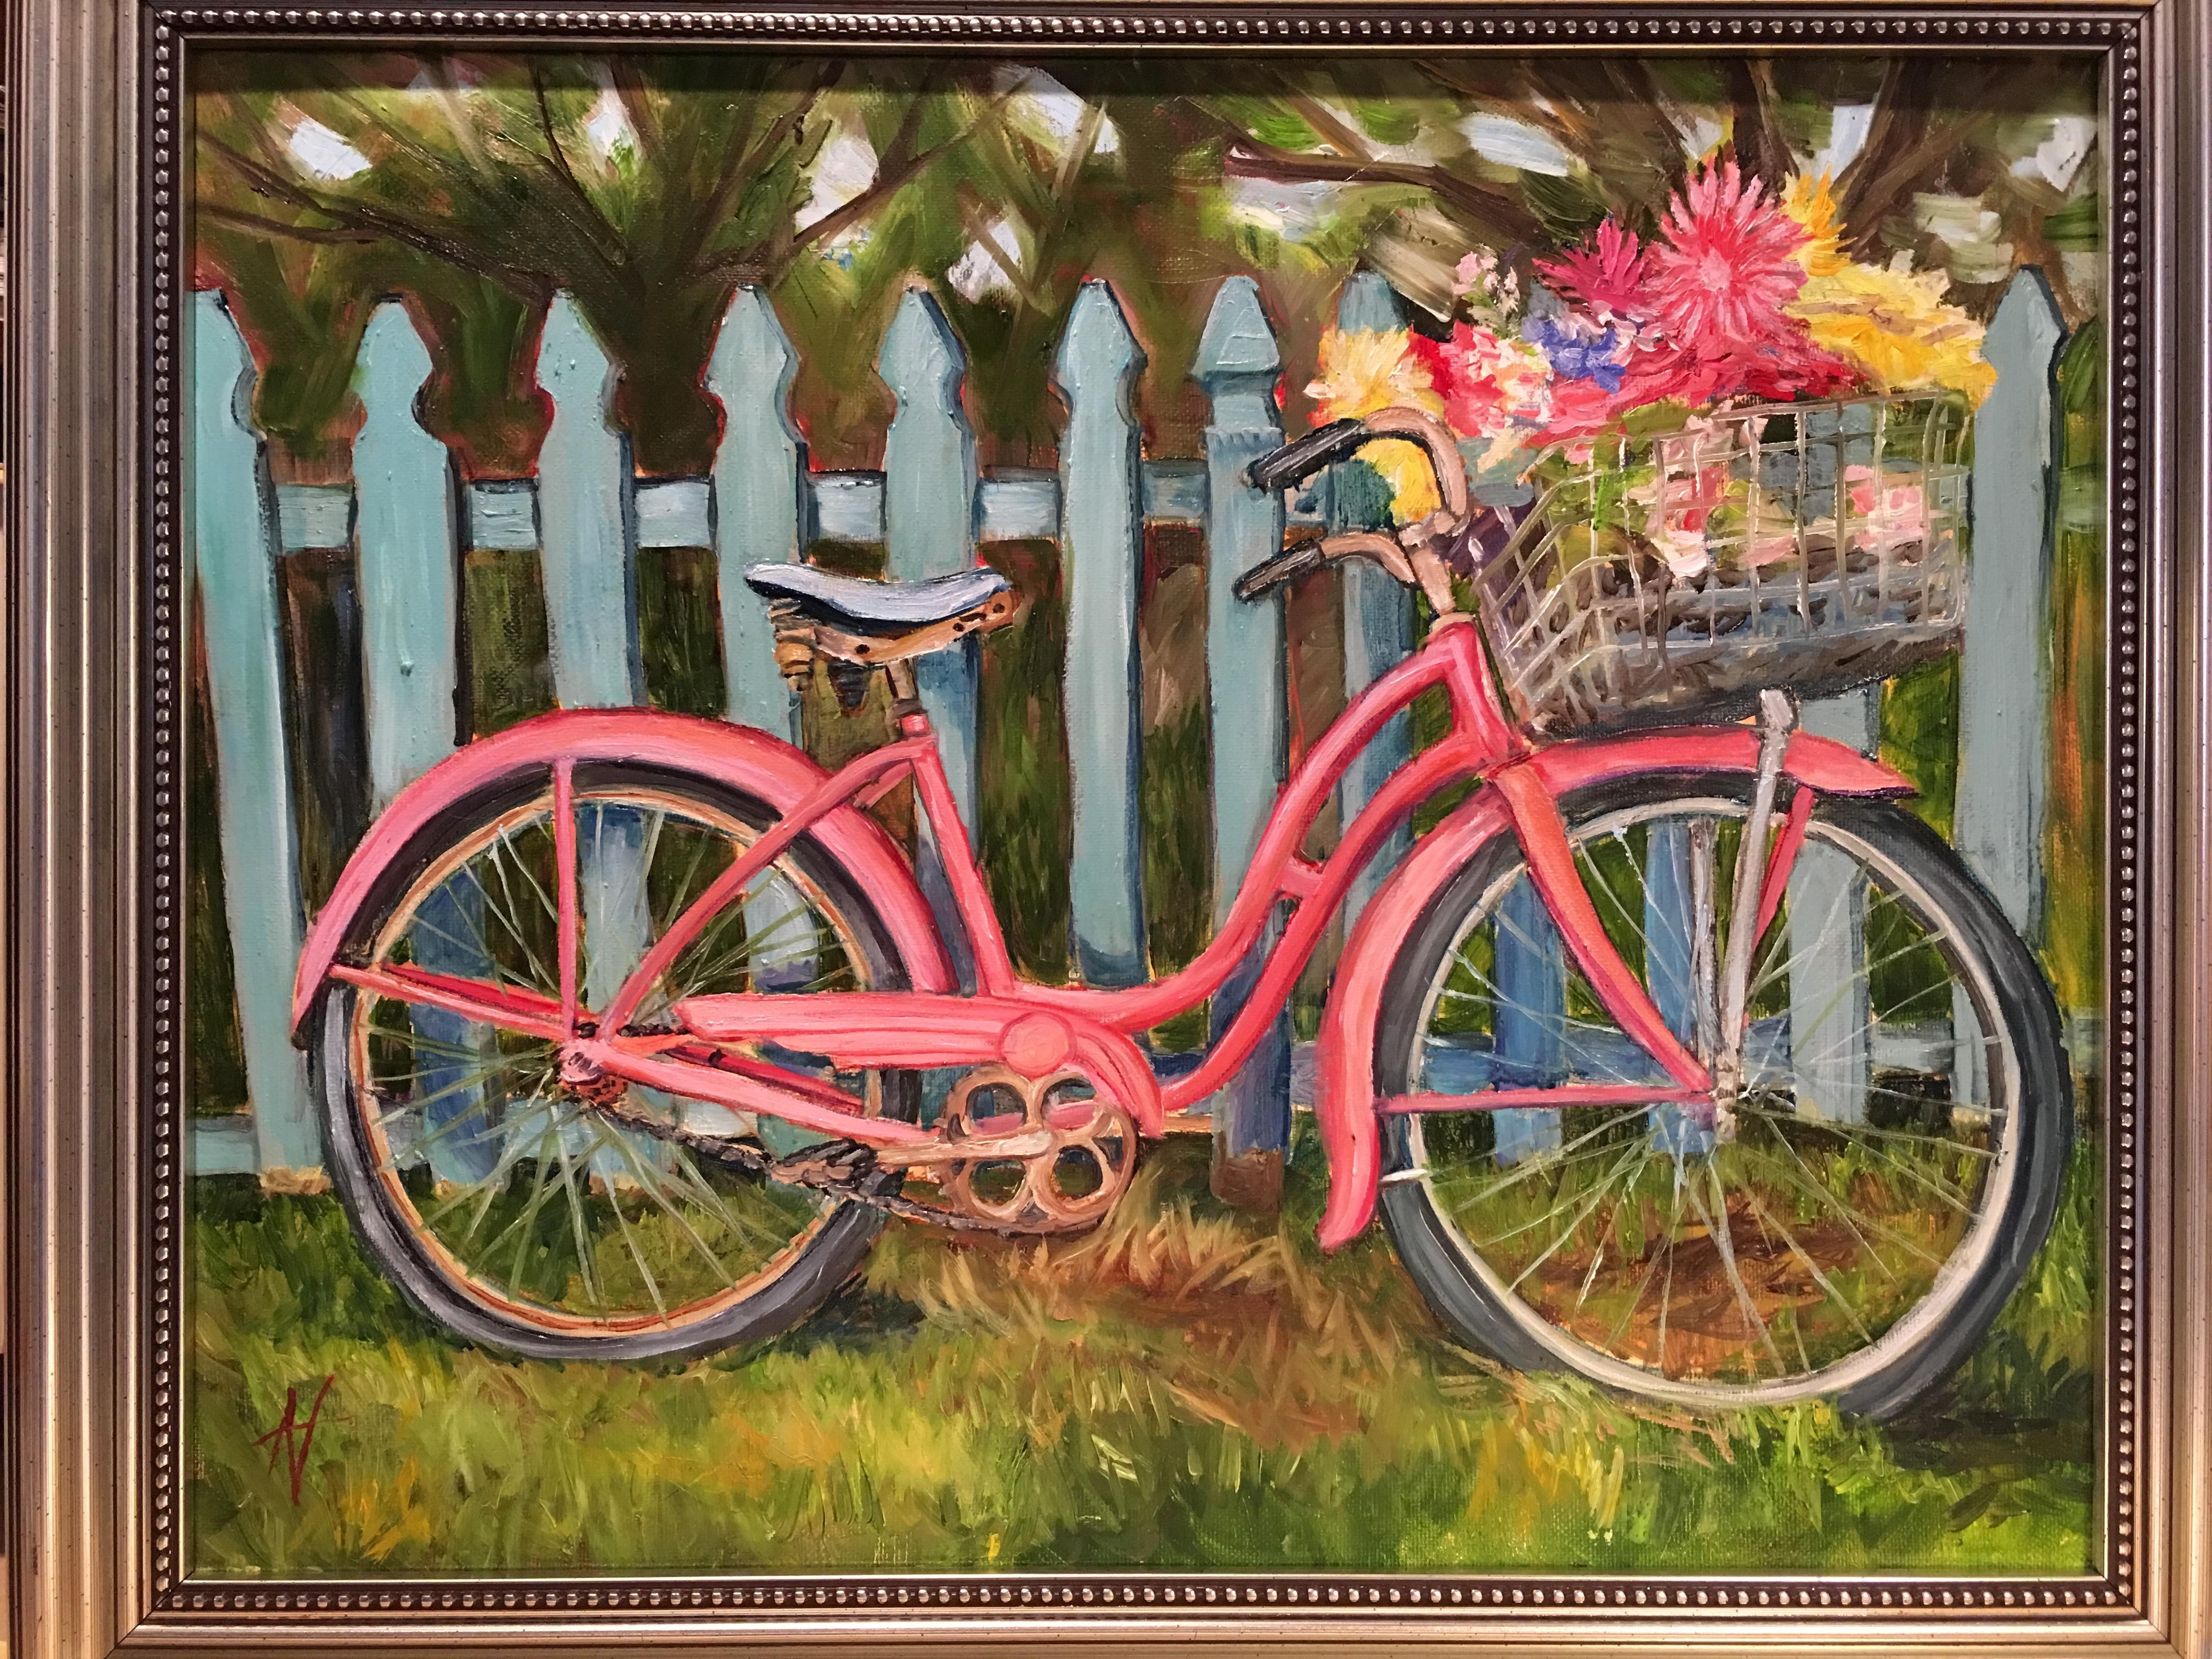 The Camas Bike